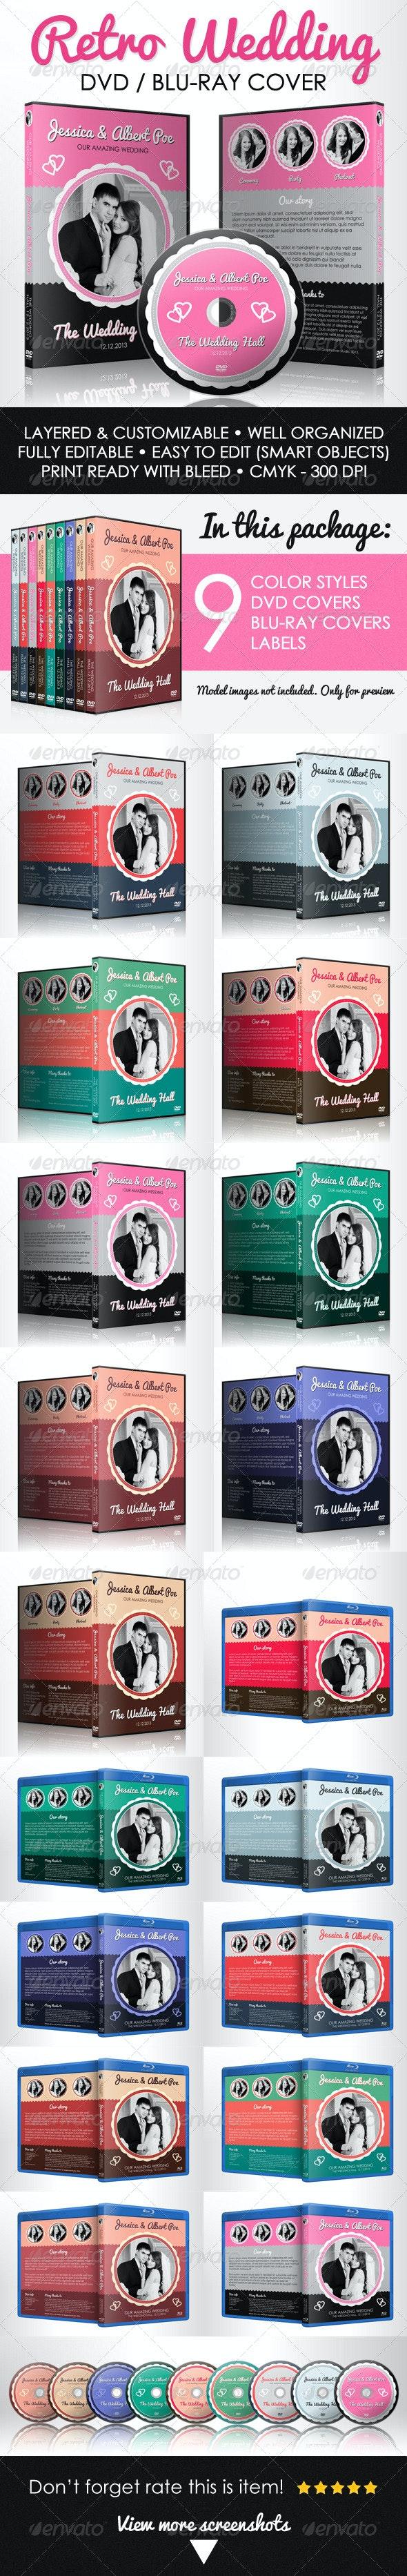 Retro Wedding DVD & Blu-ray Cover With Disc Label - CD & DVD Artwork Print Templates